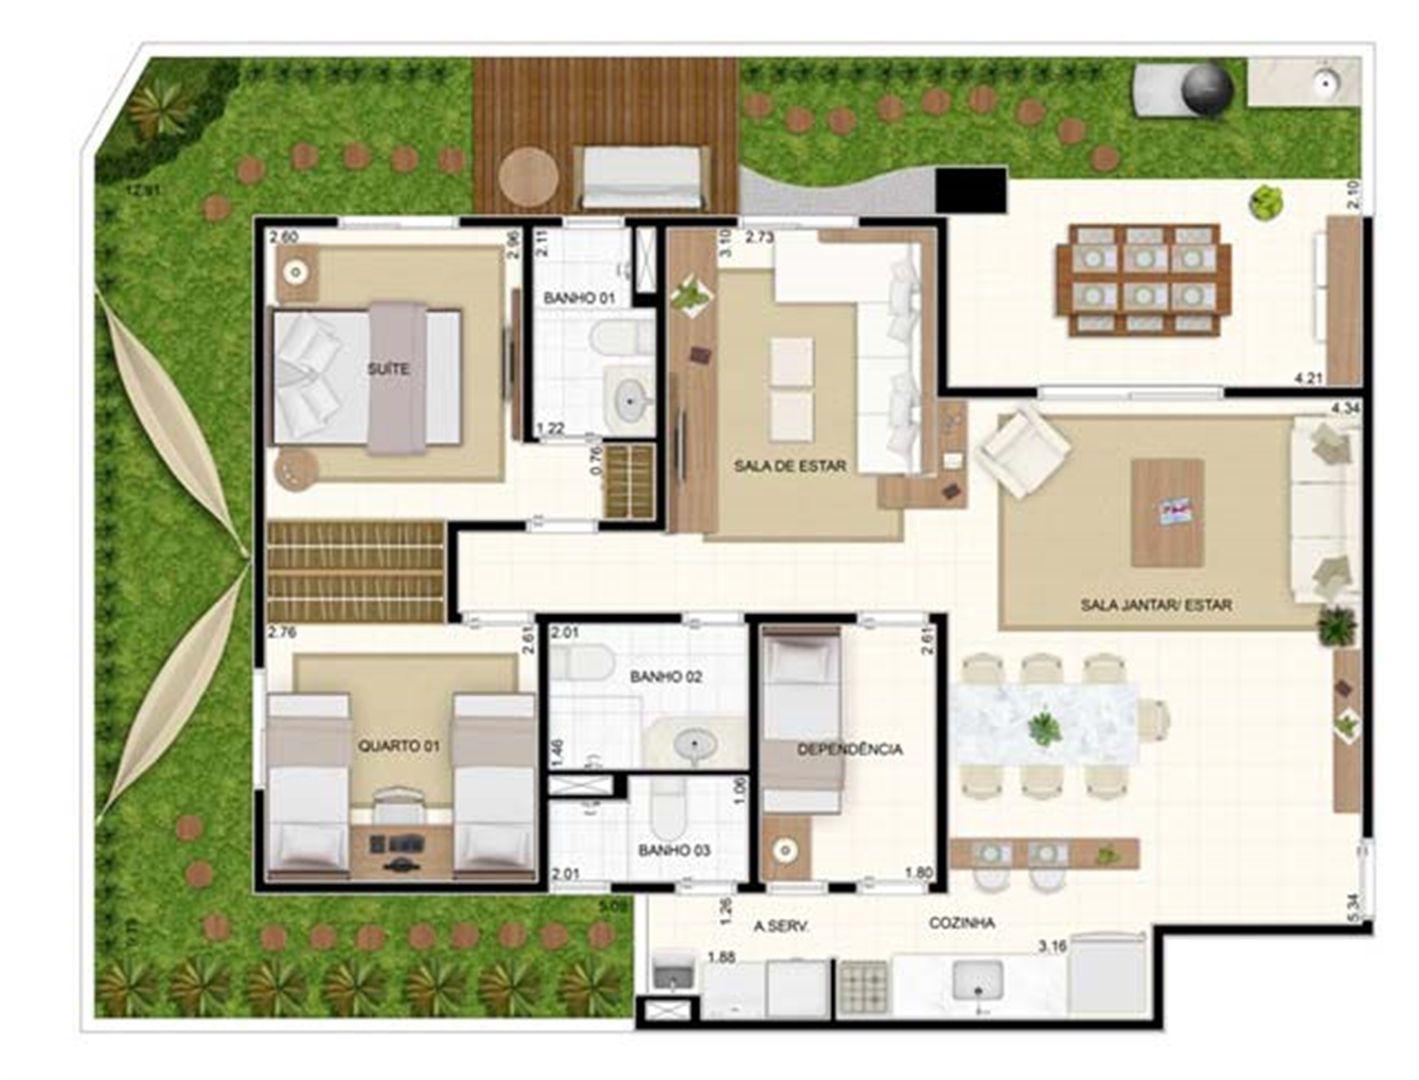 Giardino 3 dorms Sala Ampliada 129,10m² | Vita 2 Residencial Clube – Apartamento no  Pitimbu - Natal - Rio Grande do Norte